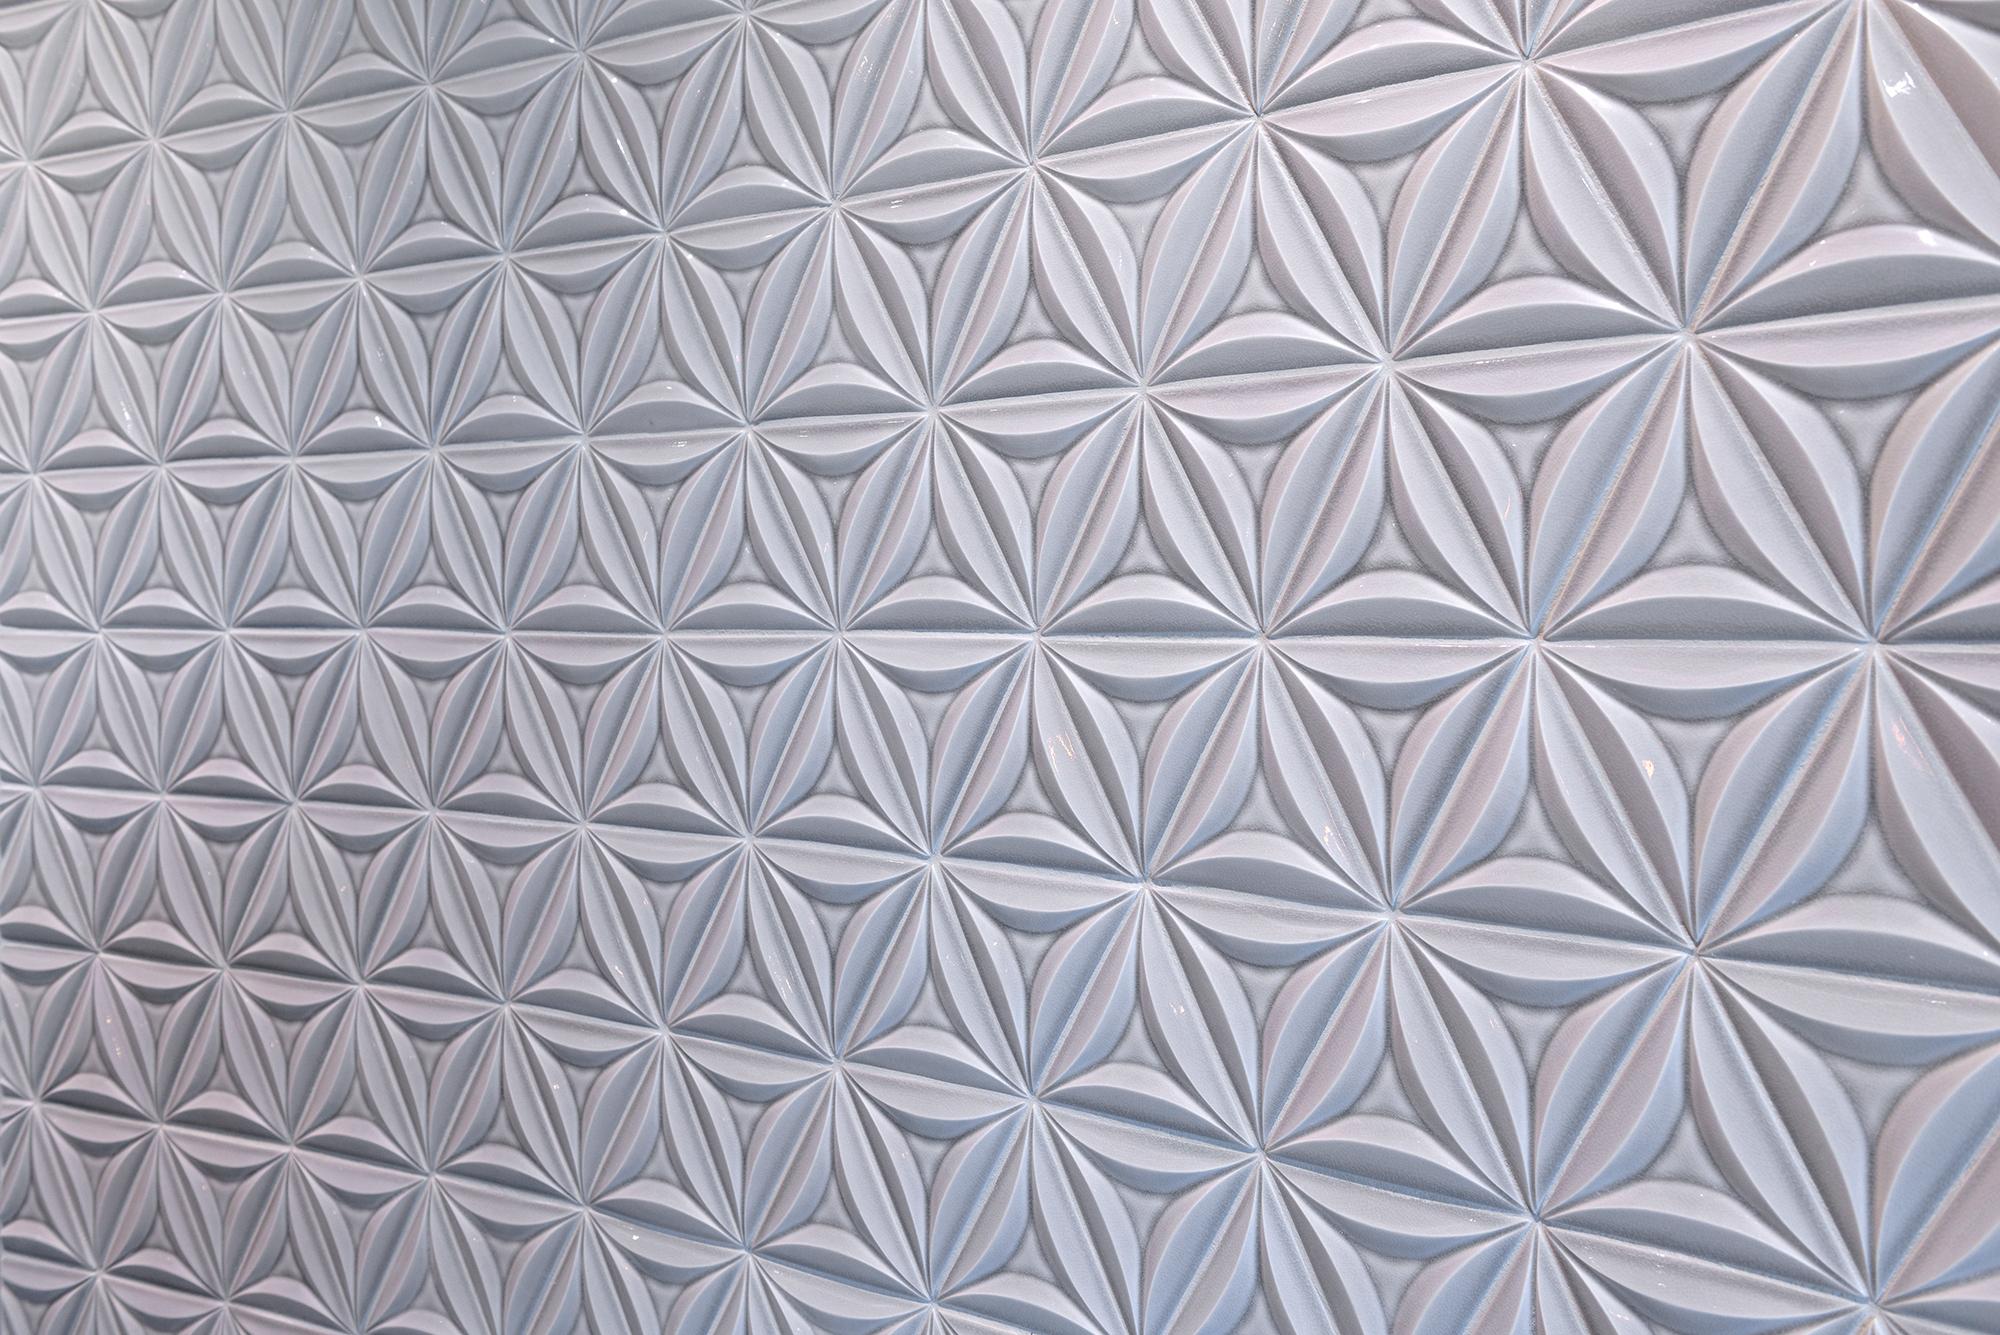 sonoma tilemakers ceramic tile design